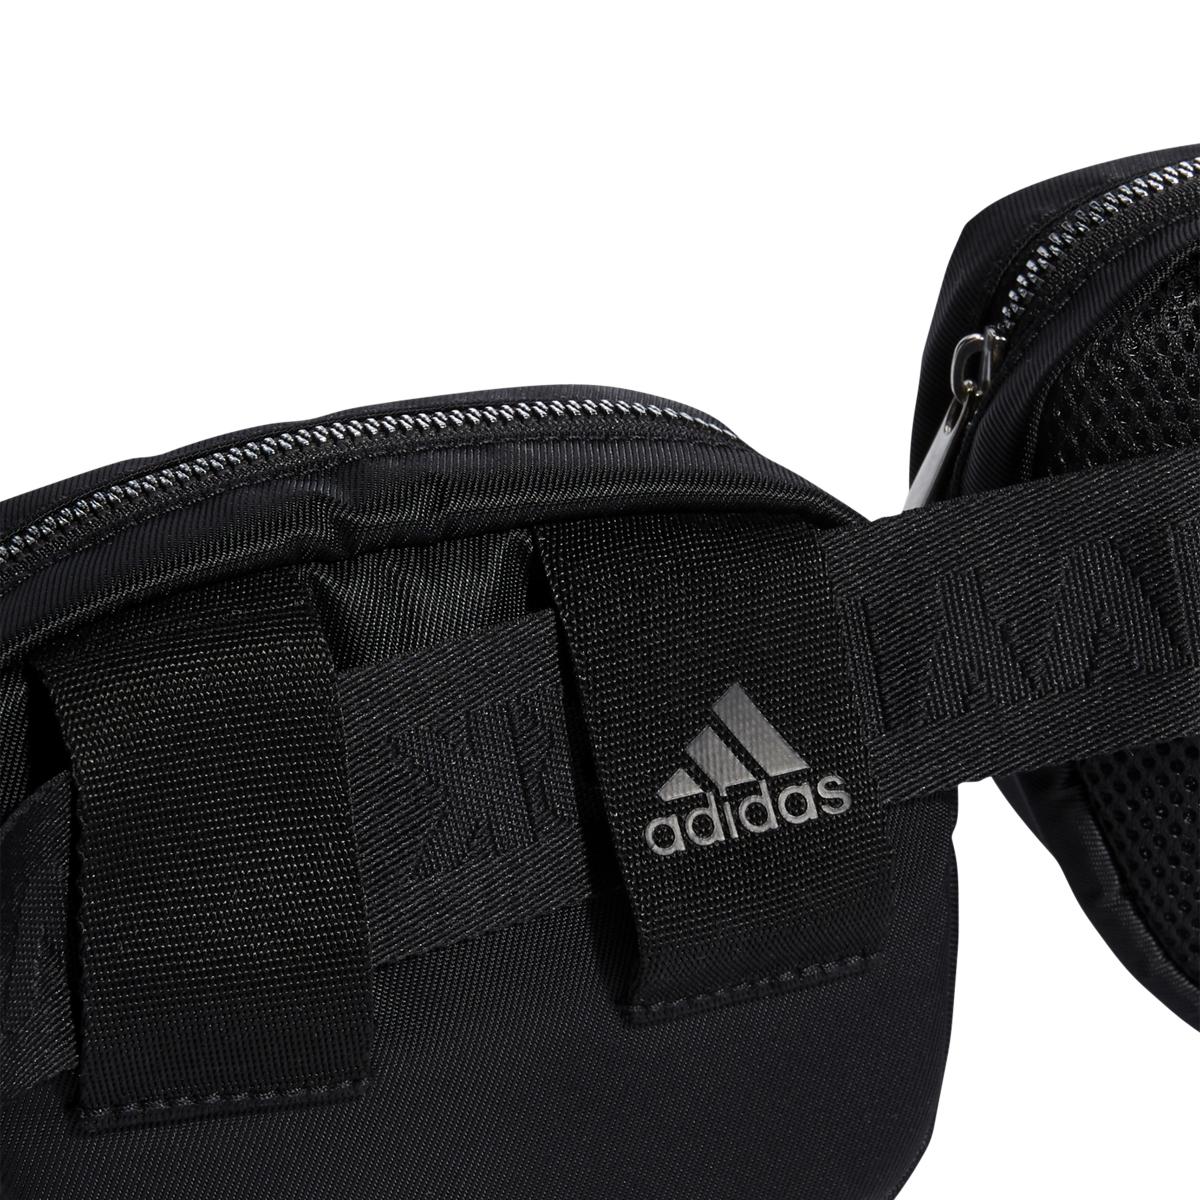 adidas IVY PARK Belt Bag